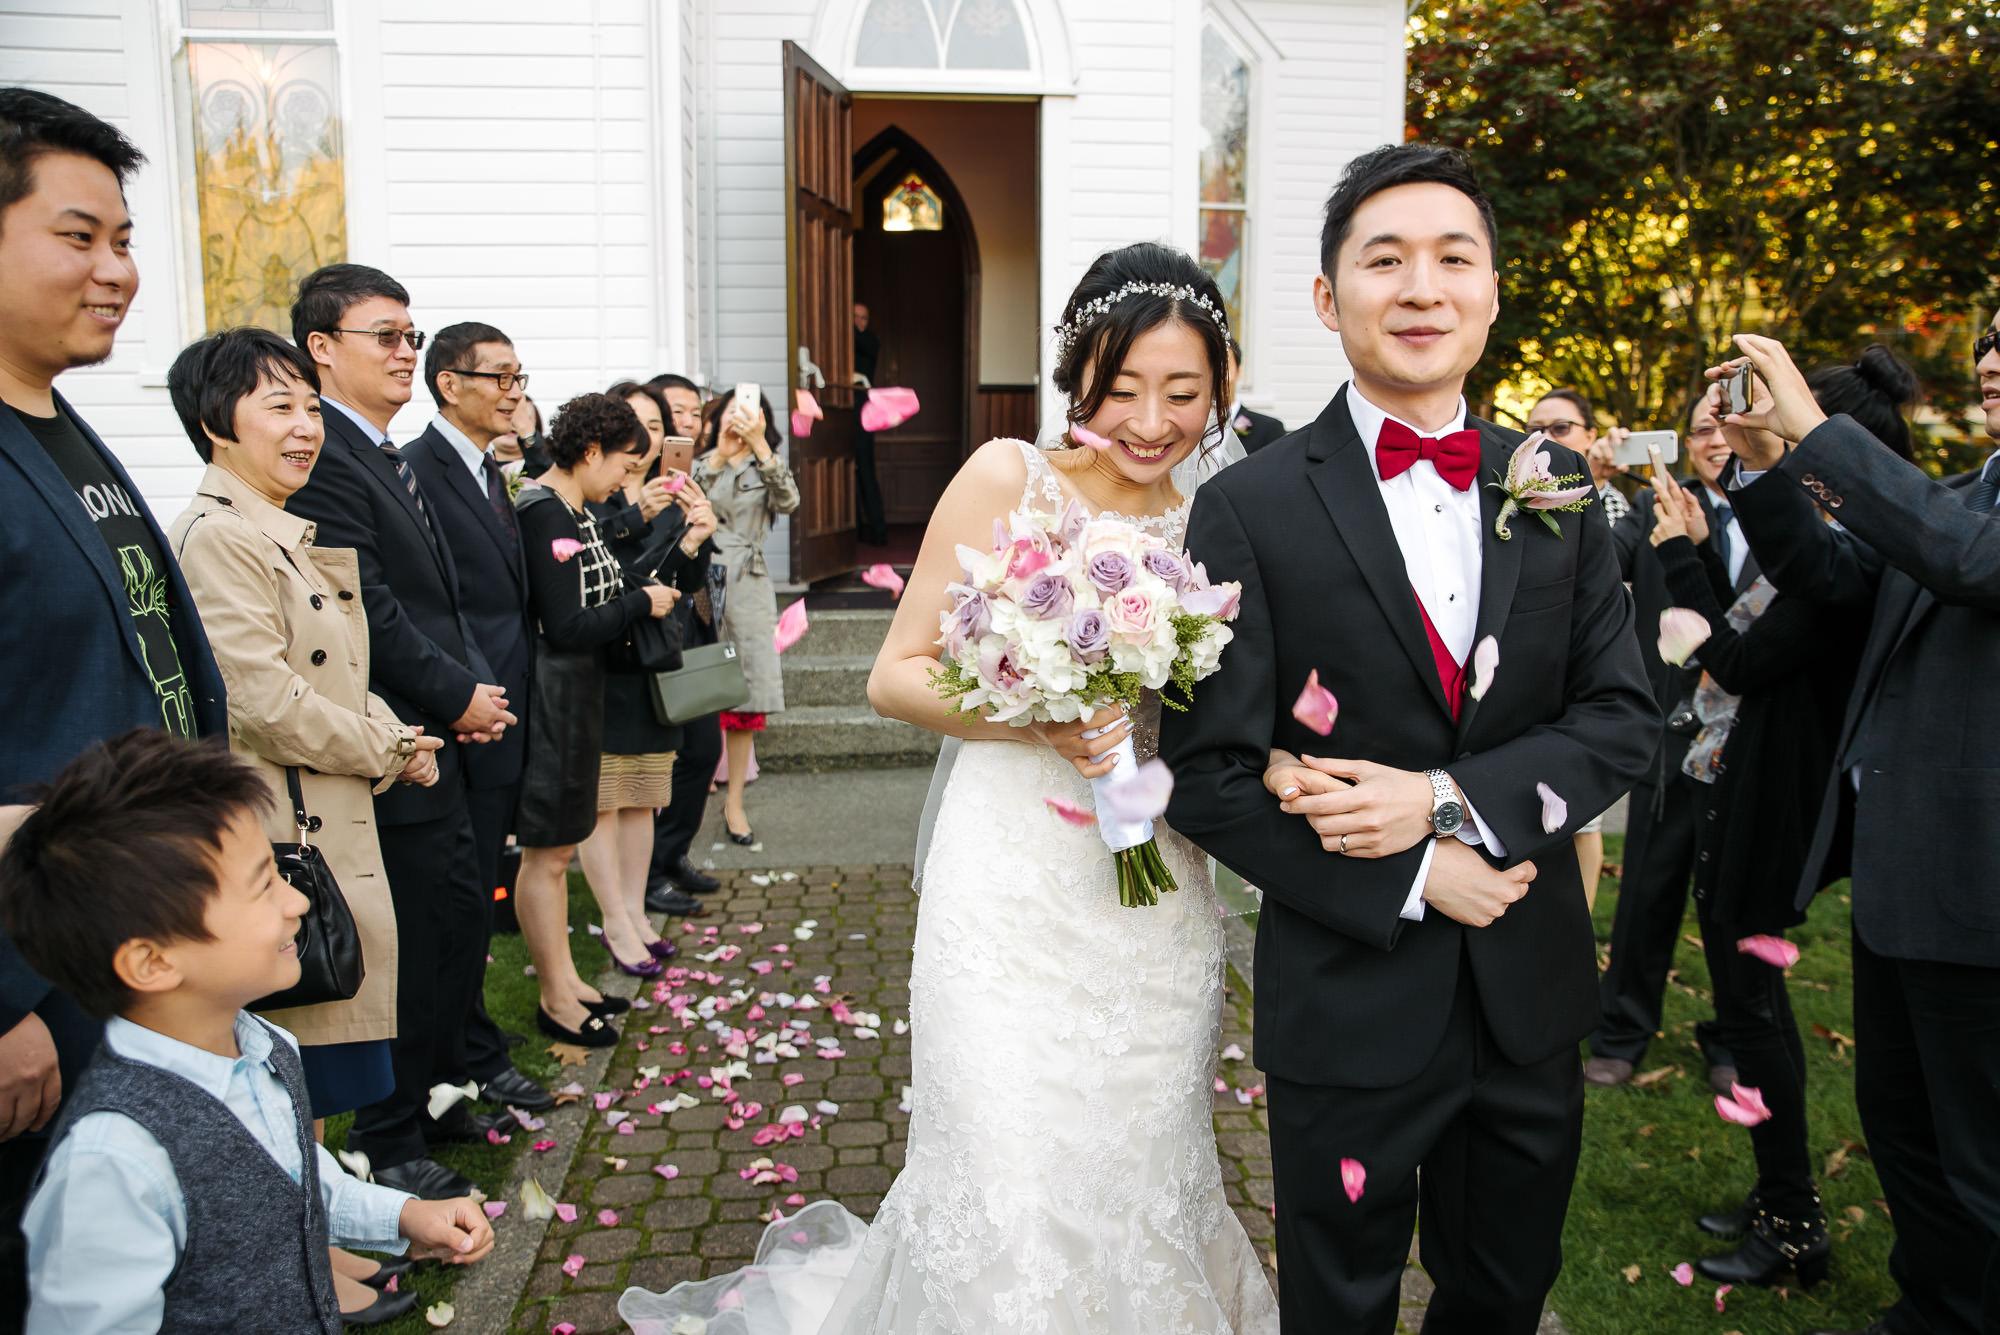 minoru_chapel_richmond_wedding_ceremony 16402416.jpg